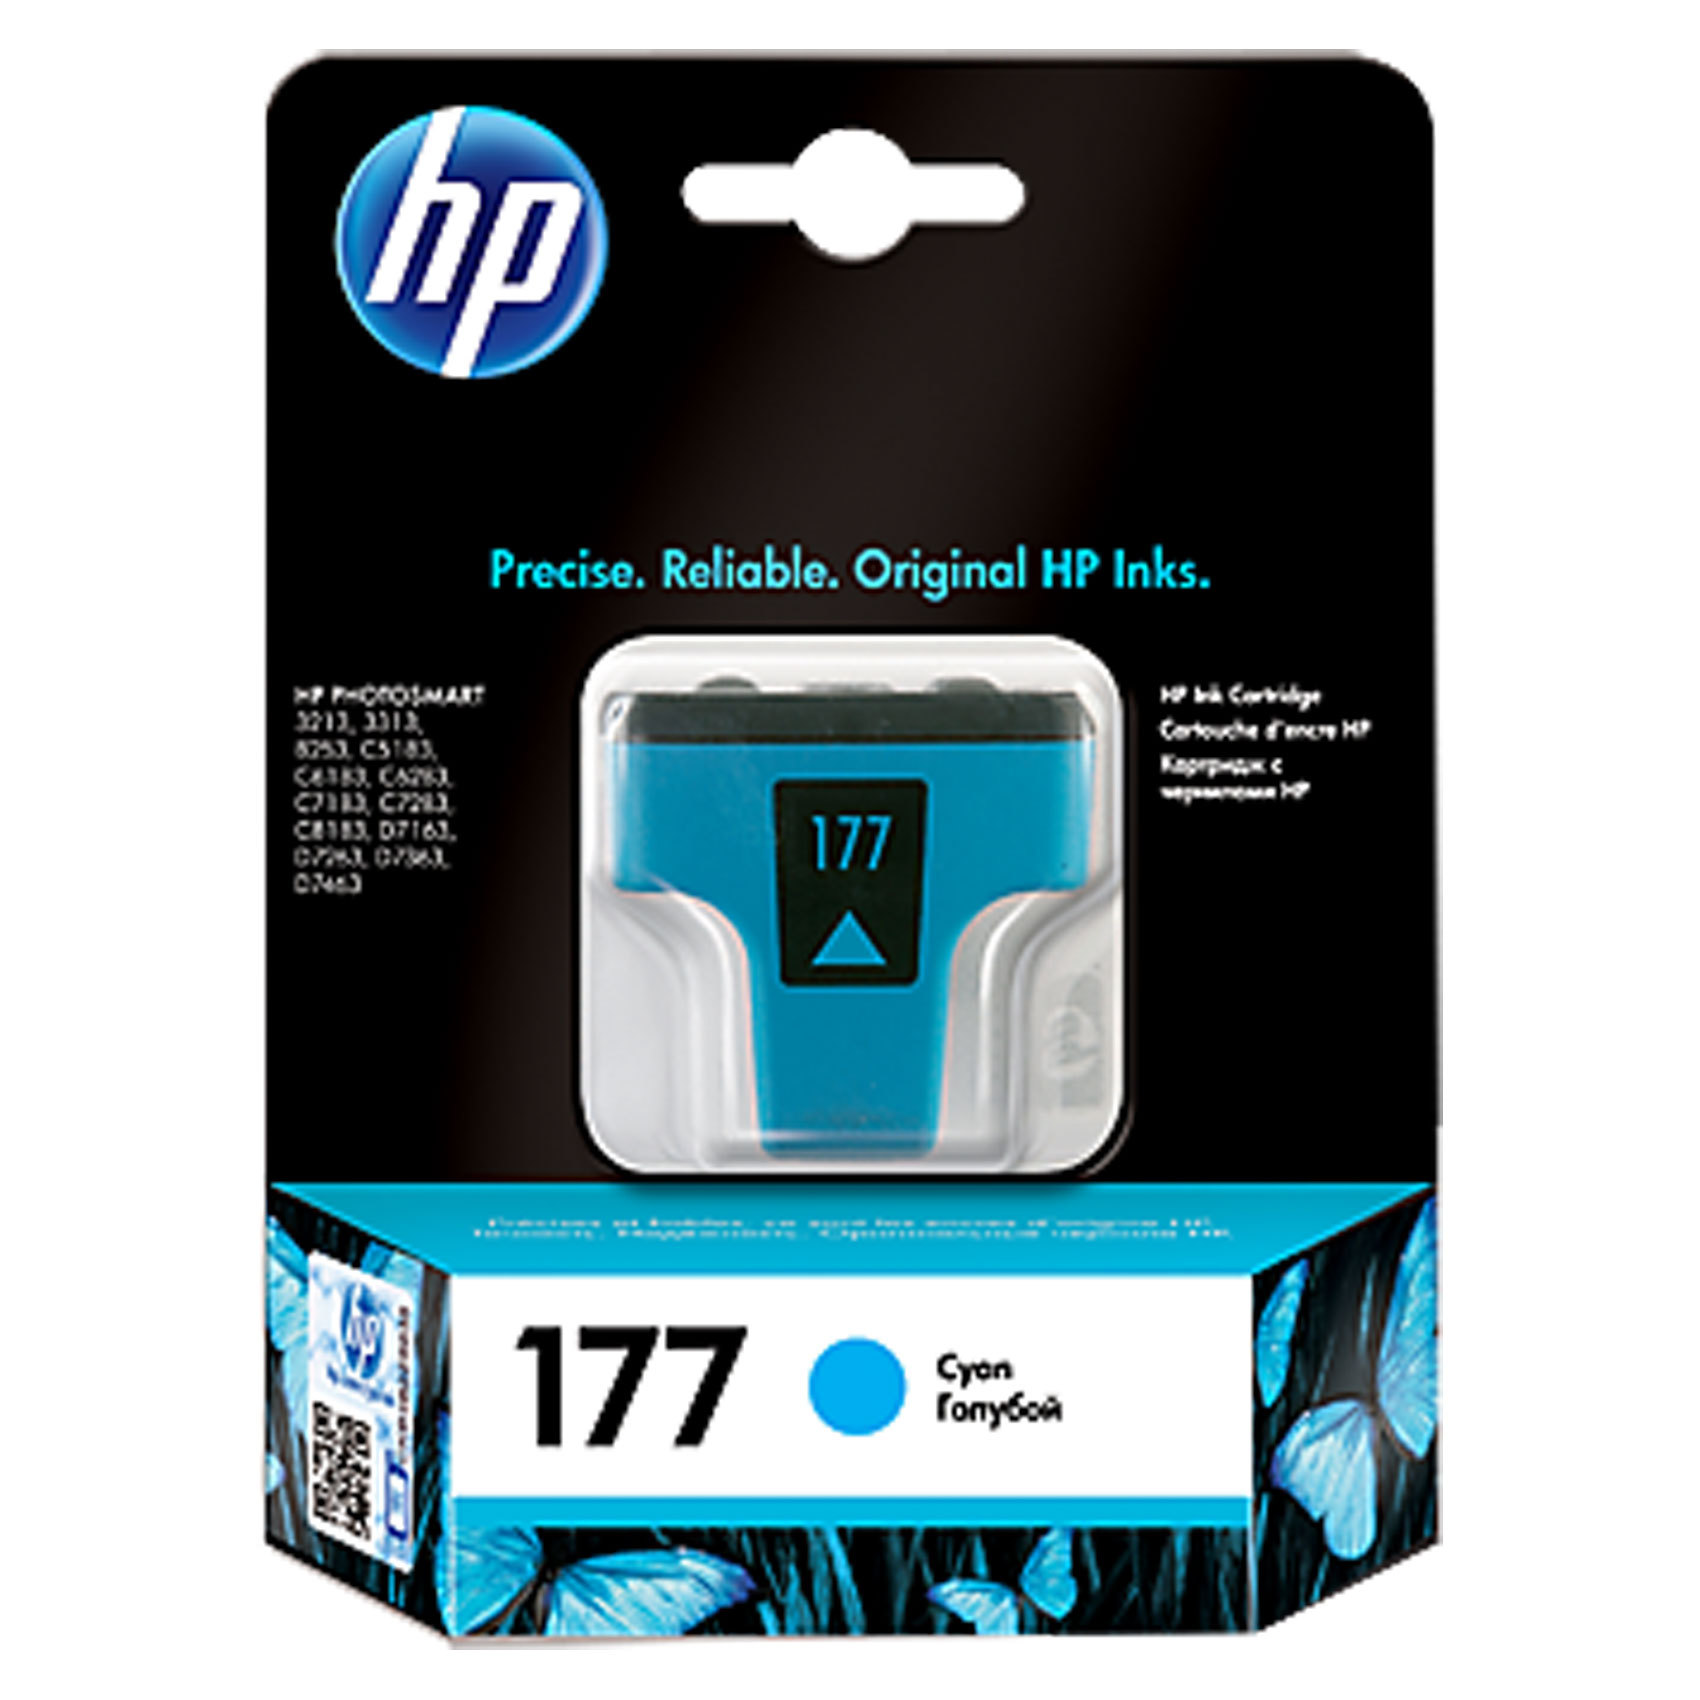 HP CART 177 CYAN SMALL